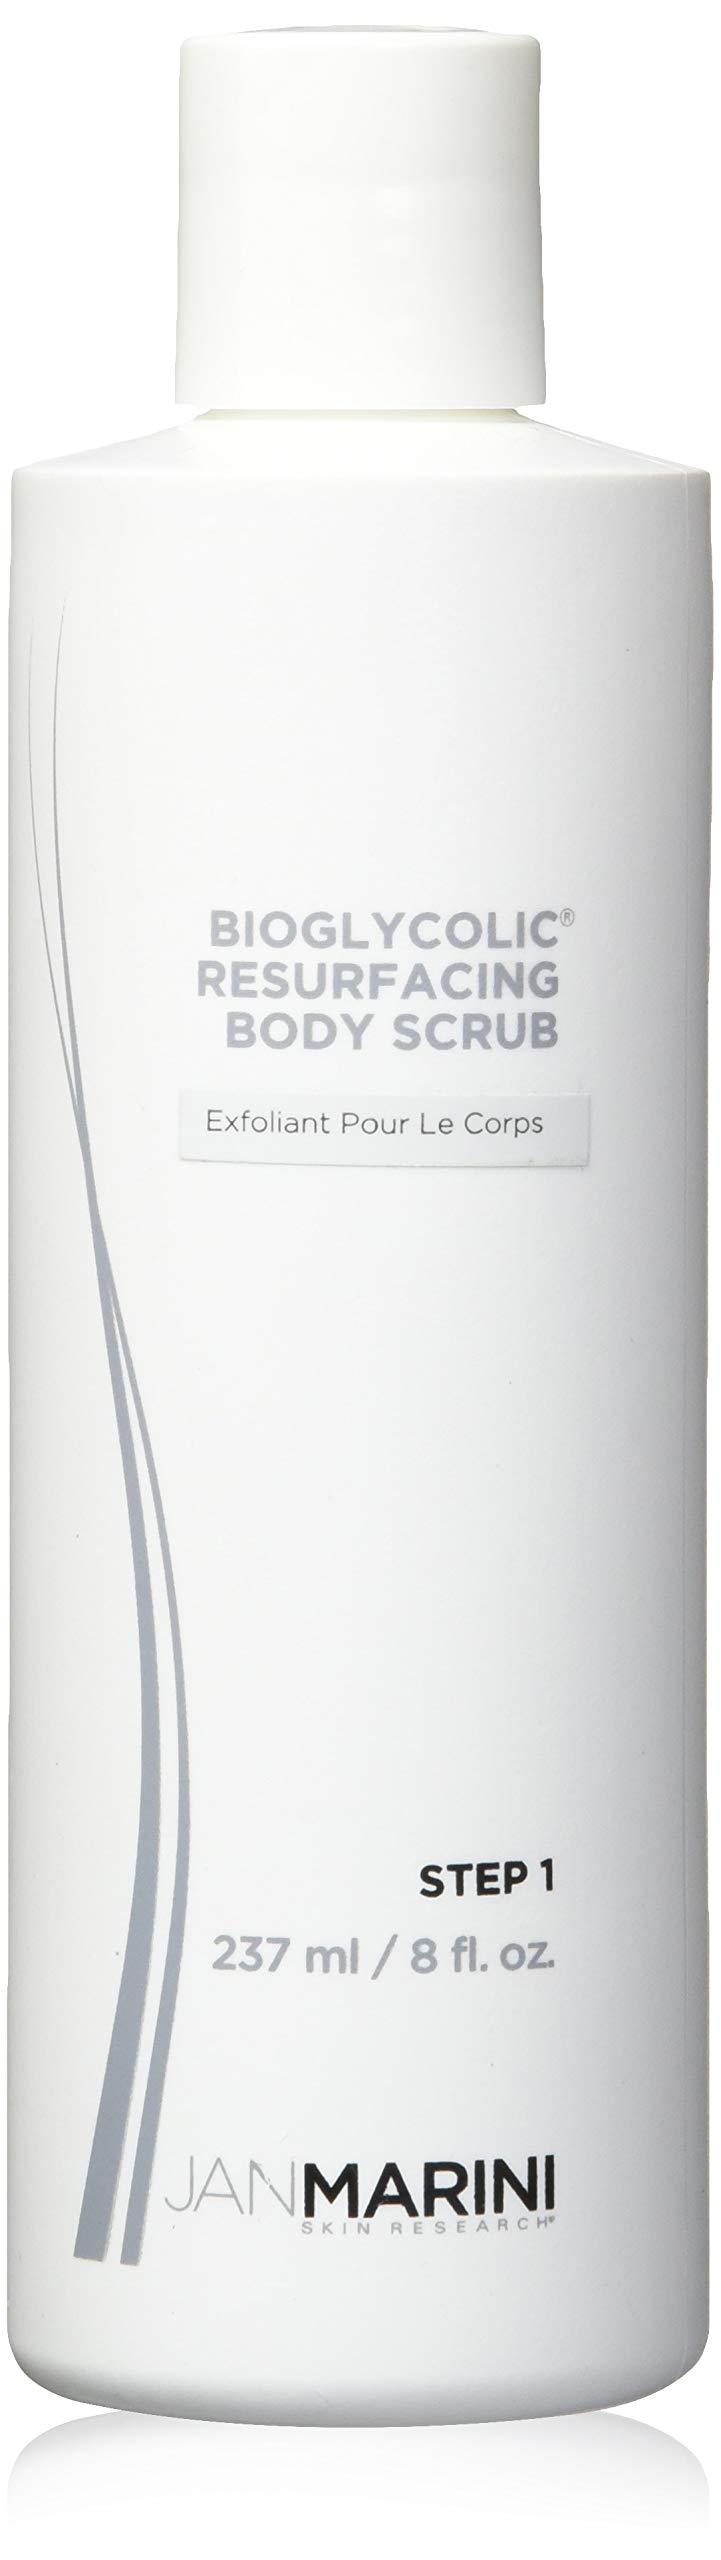 Jan Marini Skin Research Bioglycolic Resurfacing Body Scrub, 8 fl. oz. by Jan Marini Skin Research